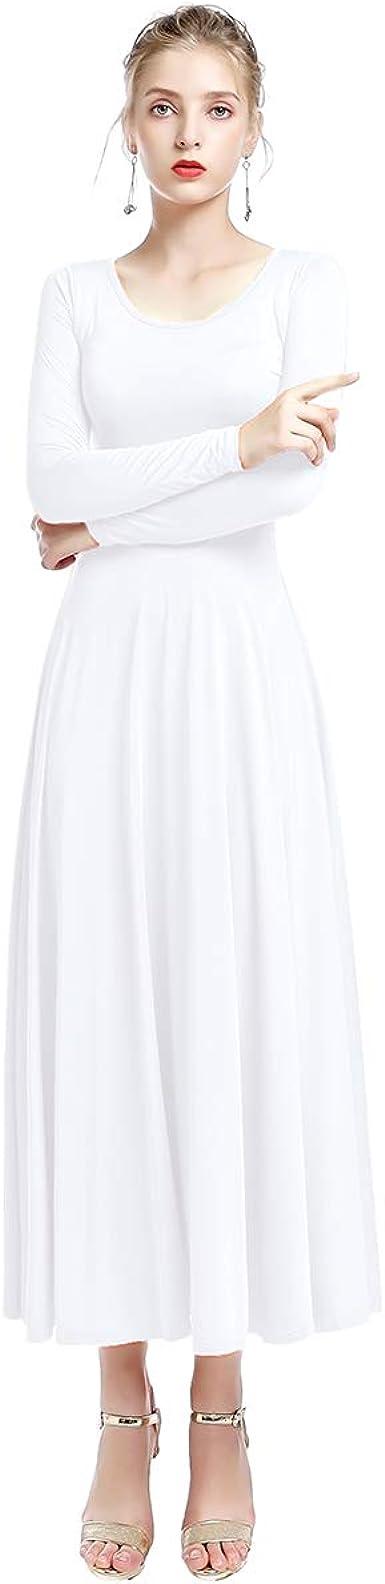 FYMNSI Vestido Largo Litúrgico para Mujer Danza Baile Maillot ...